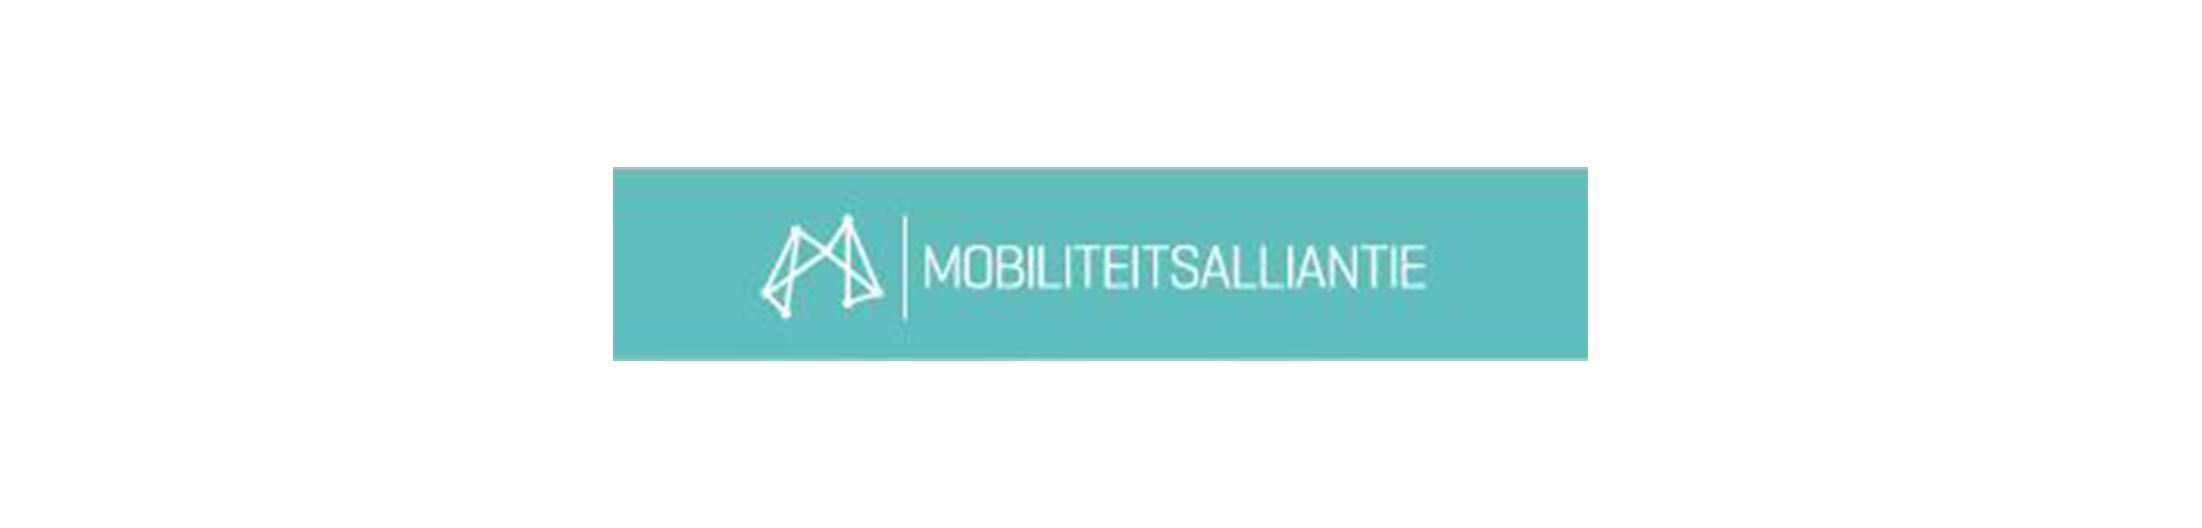 mobiliteitsalliantie